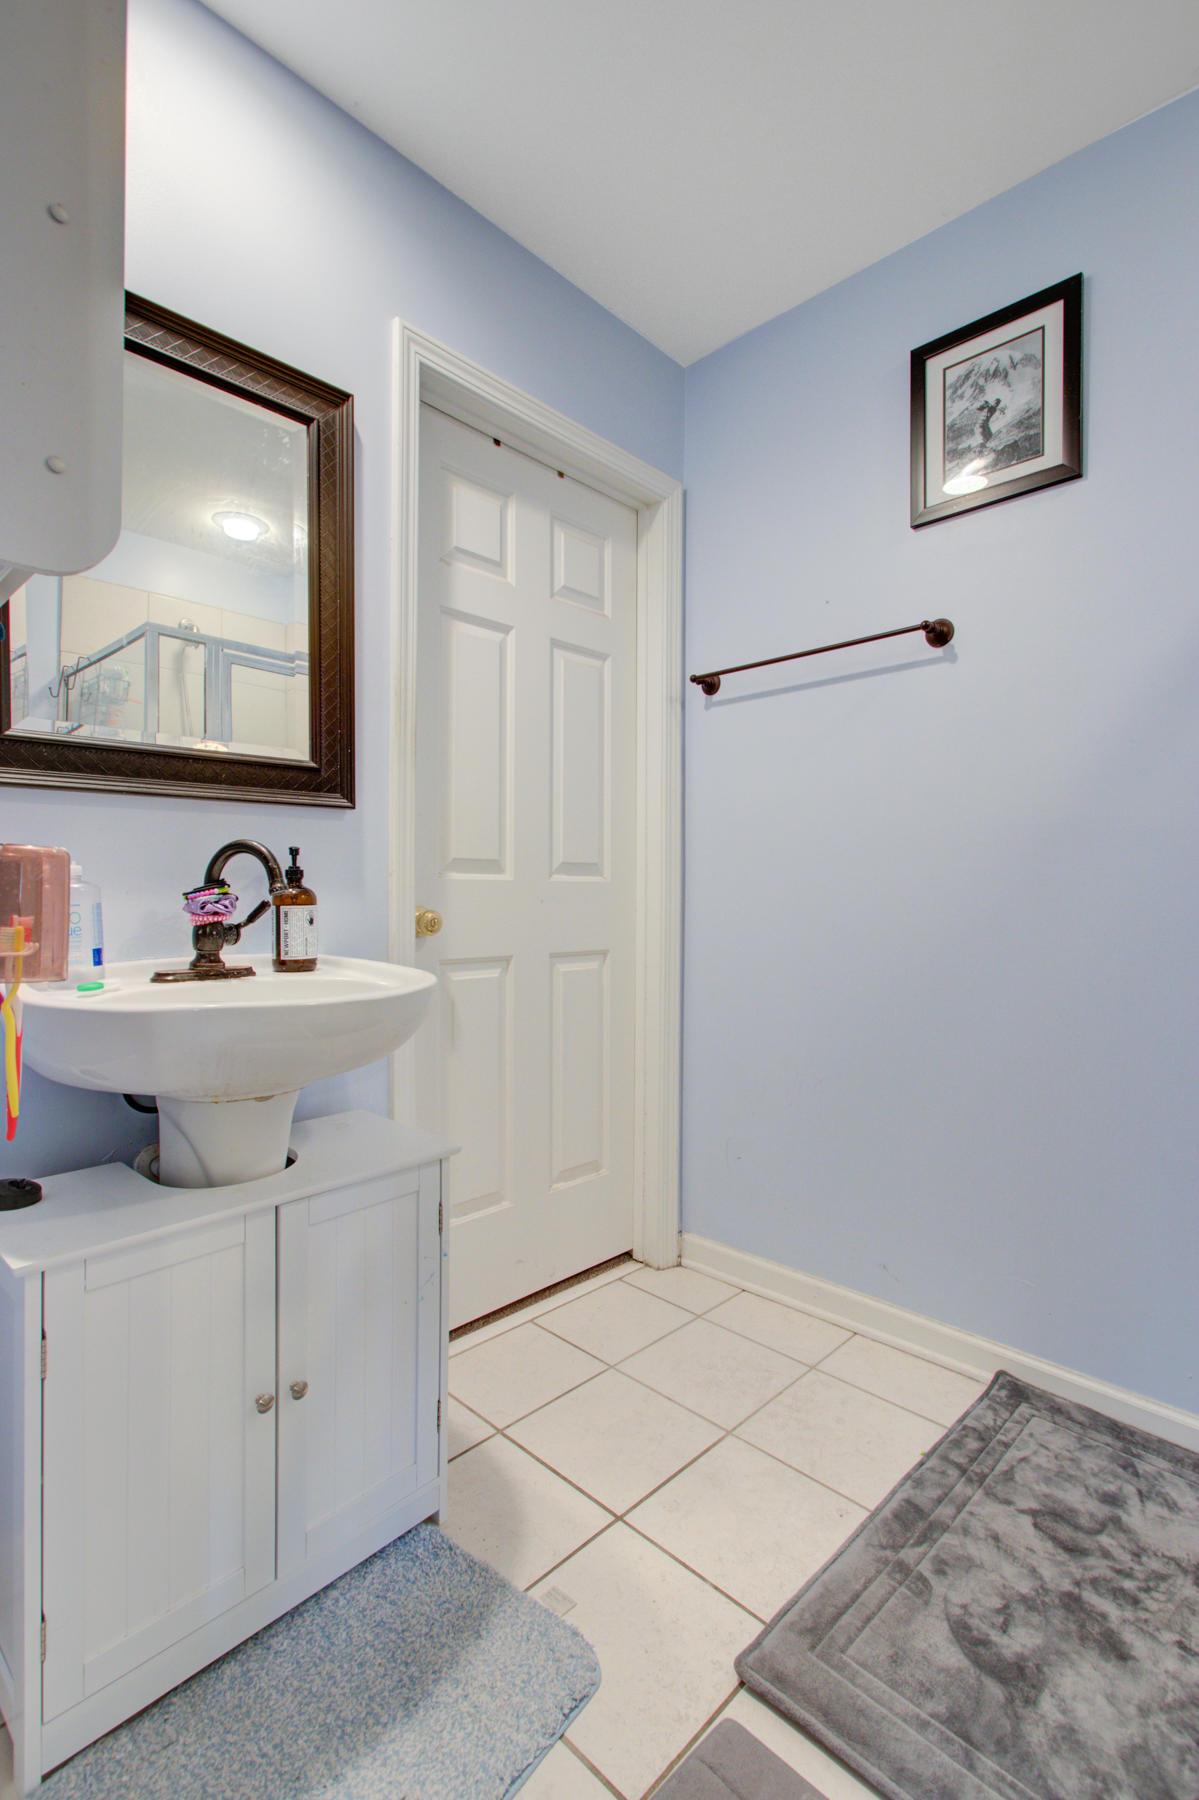 Dunes West Homes For Sale - 2232 Kings Gate, Mount Pleasant, SC - 19